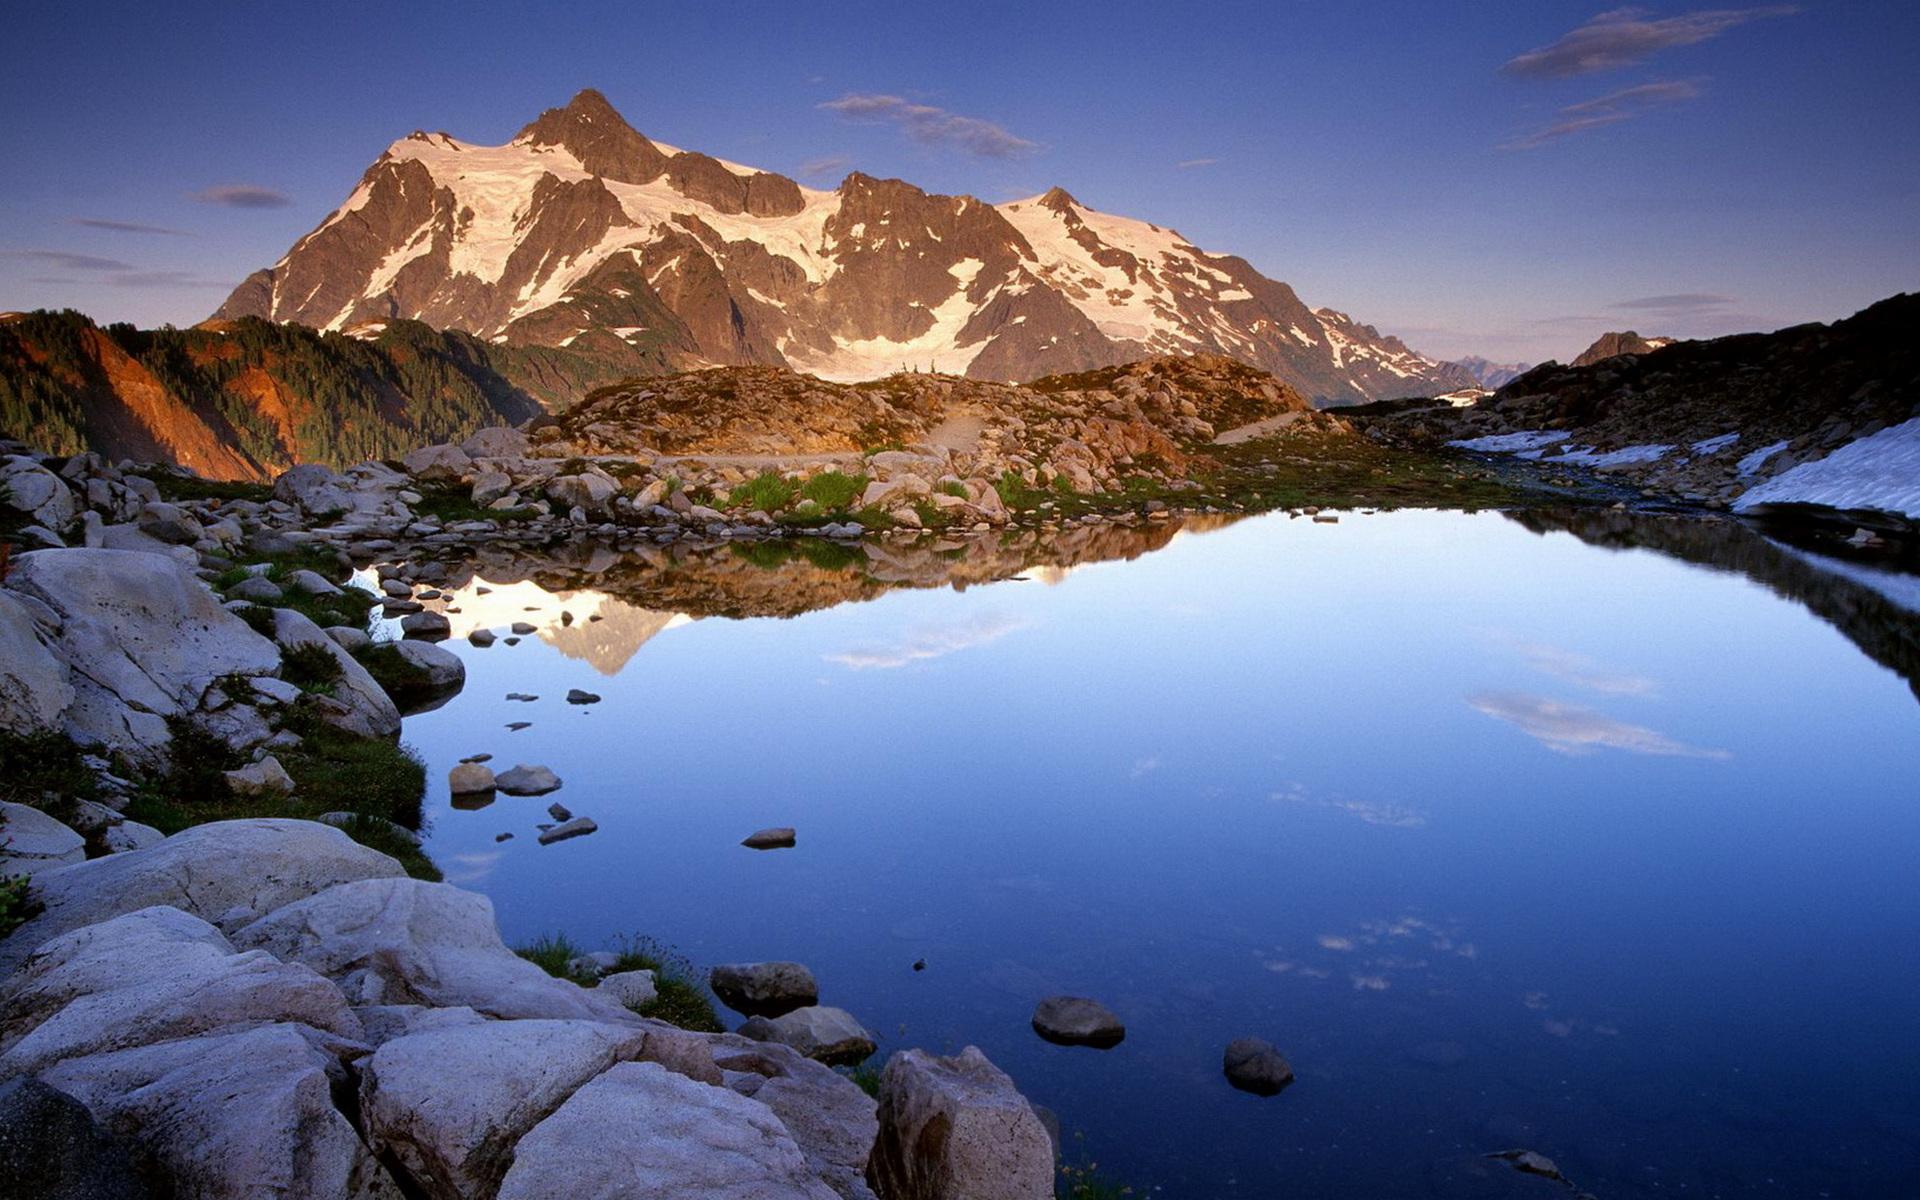 High definition mountain wallpaper wallpapersafari - Wallpaper definition ...